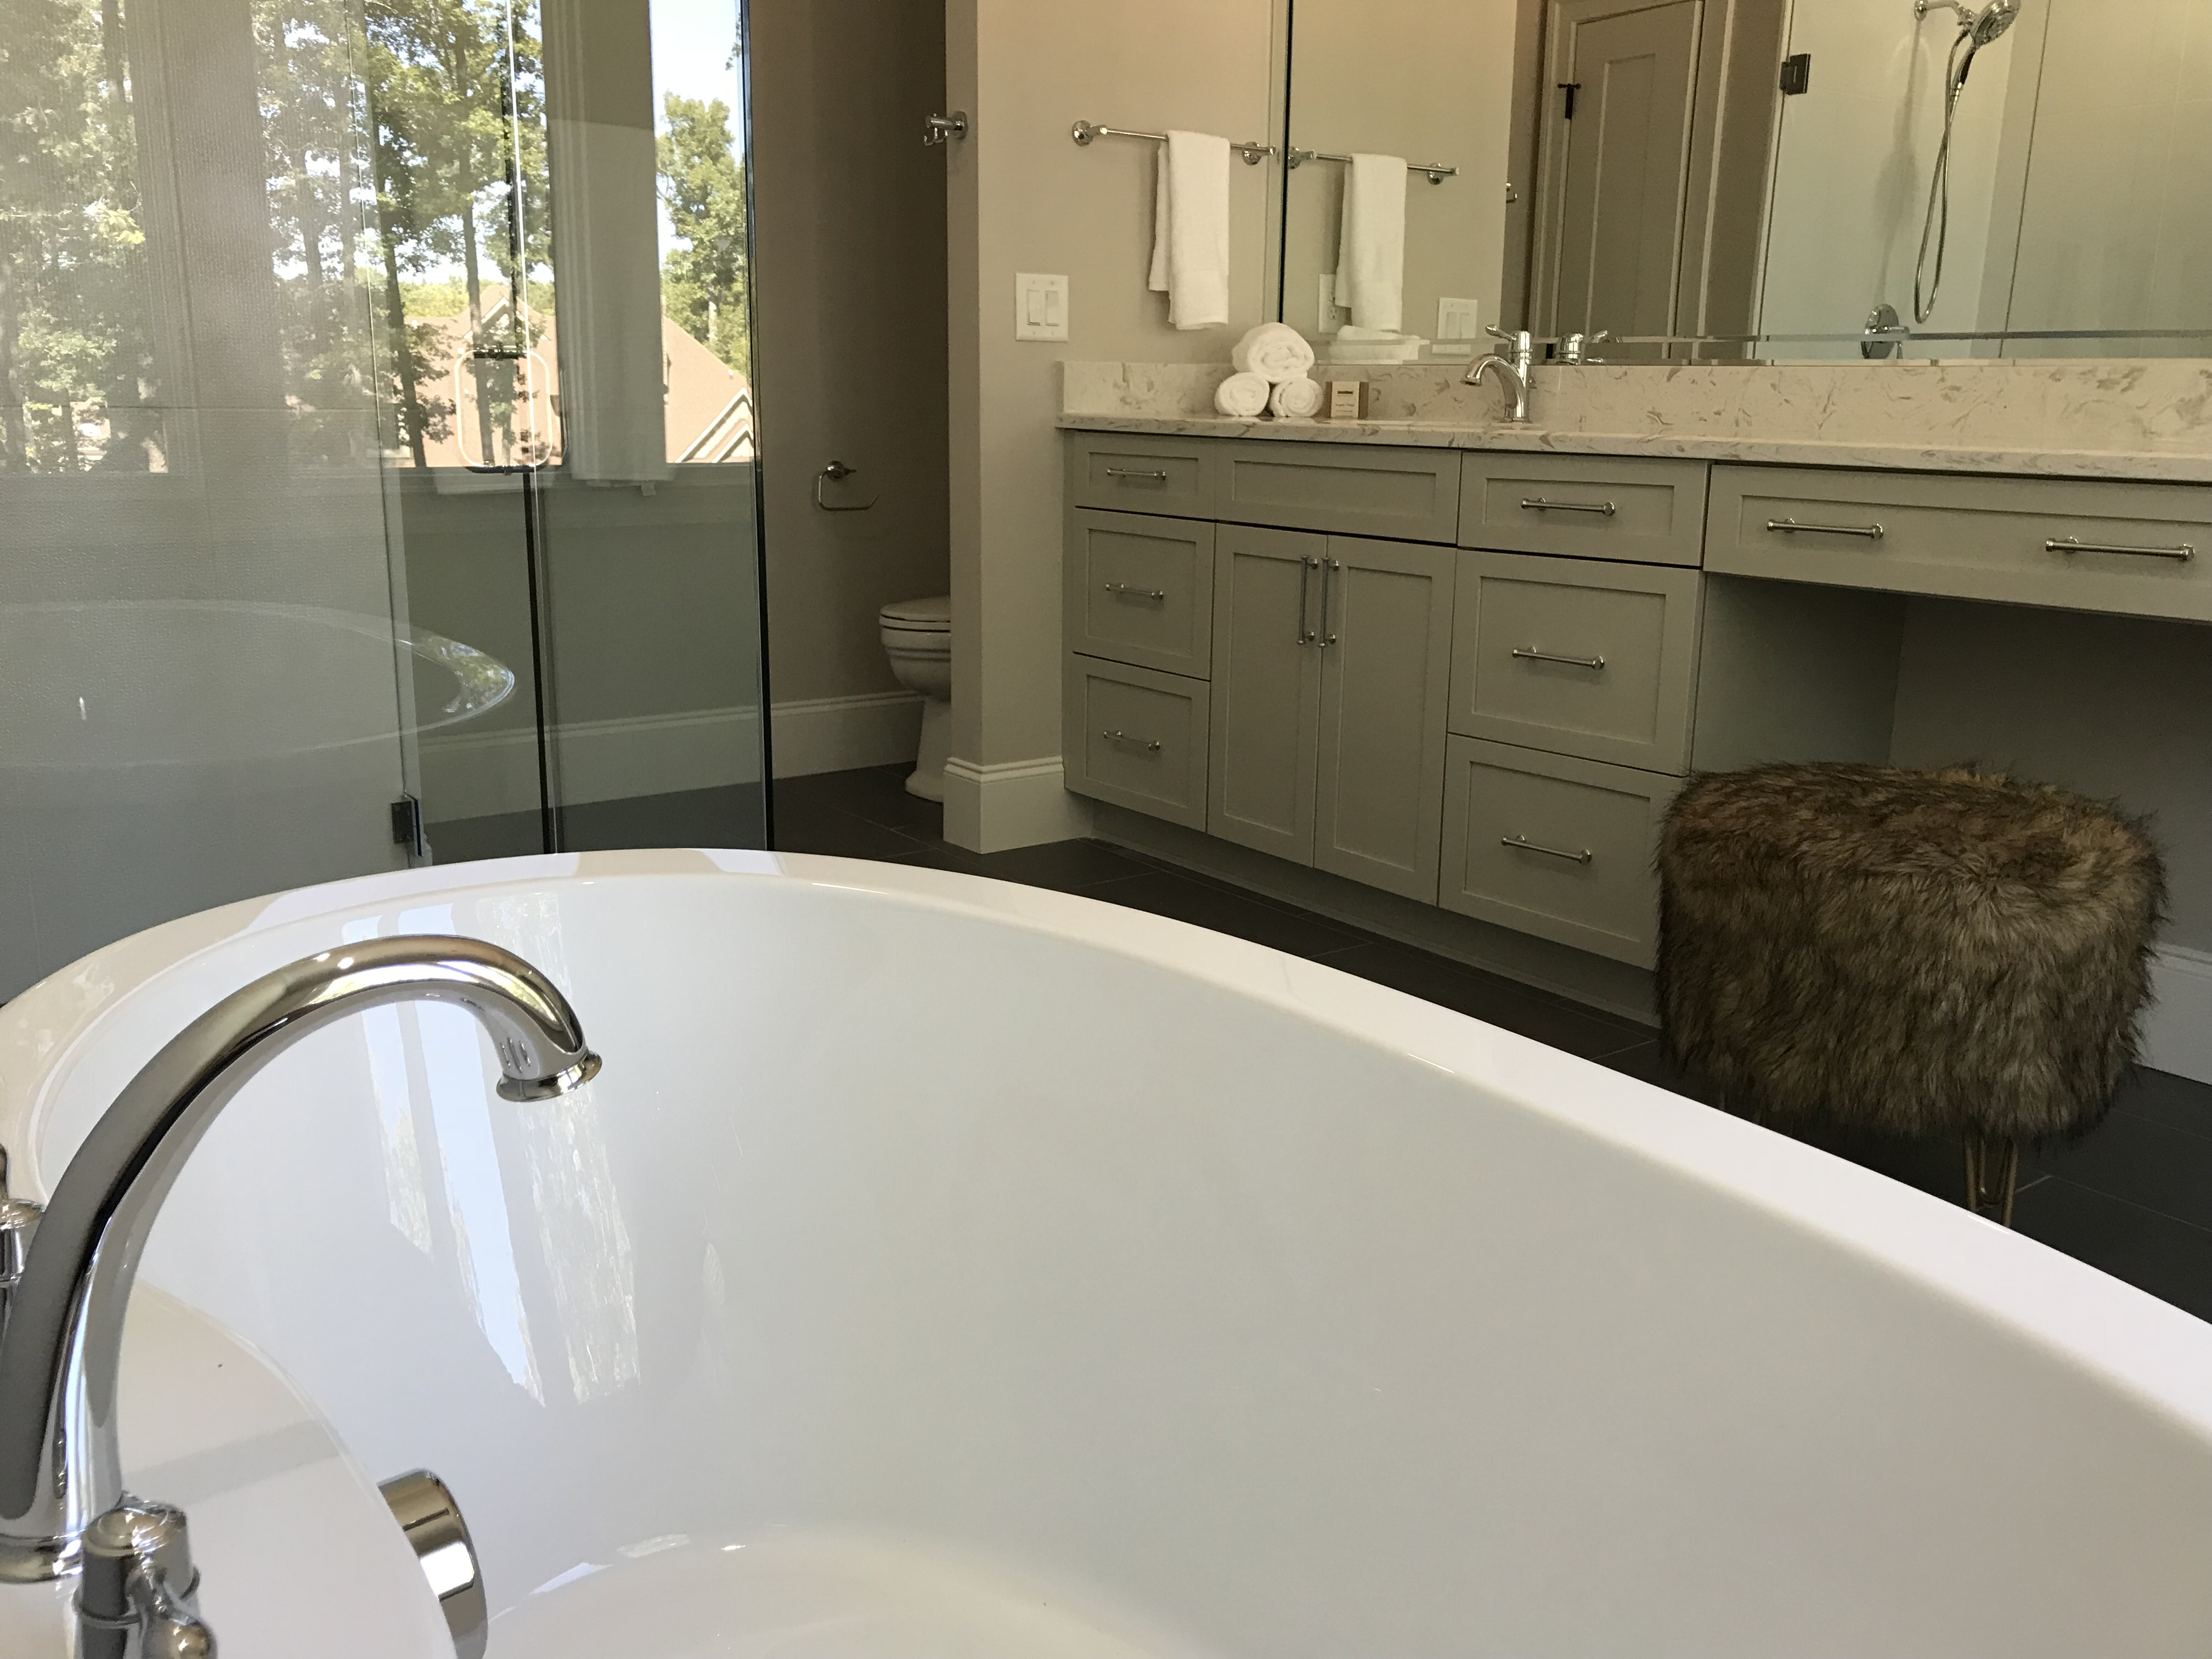 <div class='meta'><div class='origin-logo' data-origin='none'></div><span class='caption-text' data-credit='WTVD photo/Shawn Replogle'>Bathroom - 5149 Avalaire Oaks, Raleigh, NC - $1.9 million by KJ Construction</span></div>